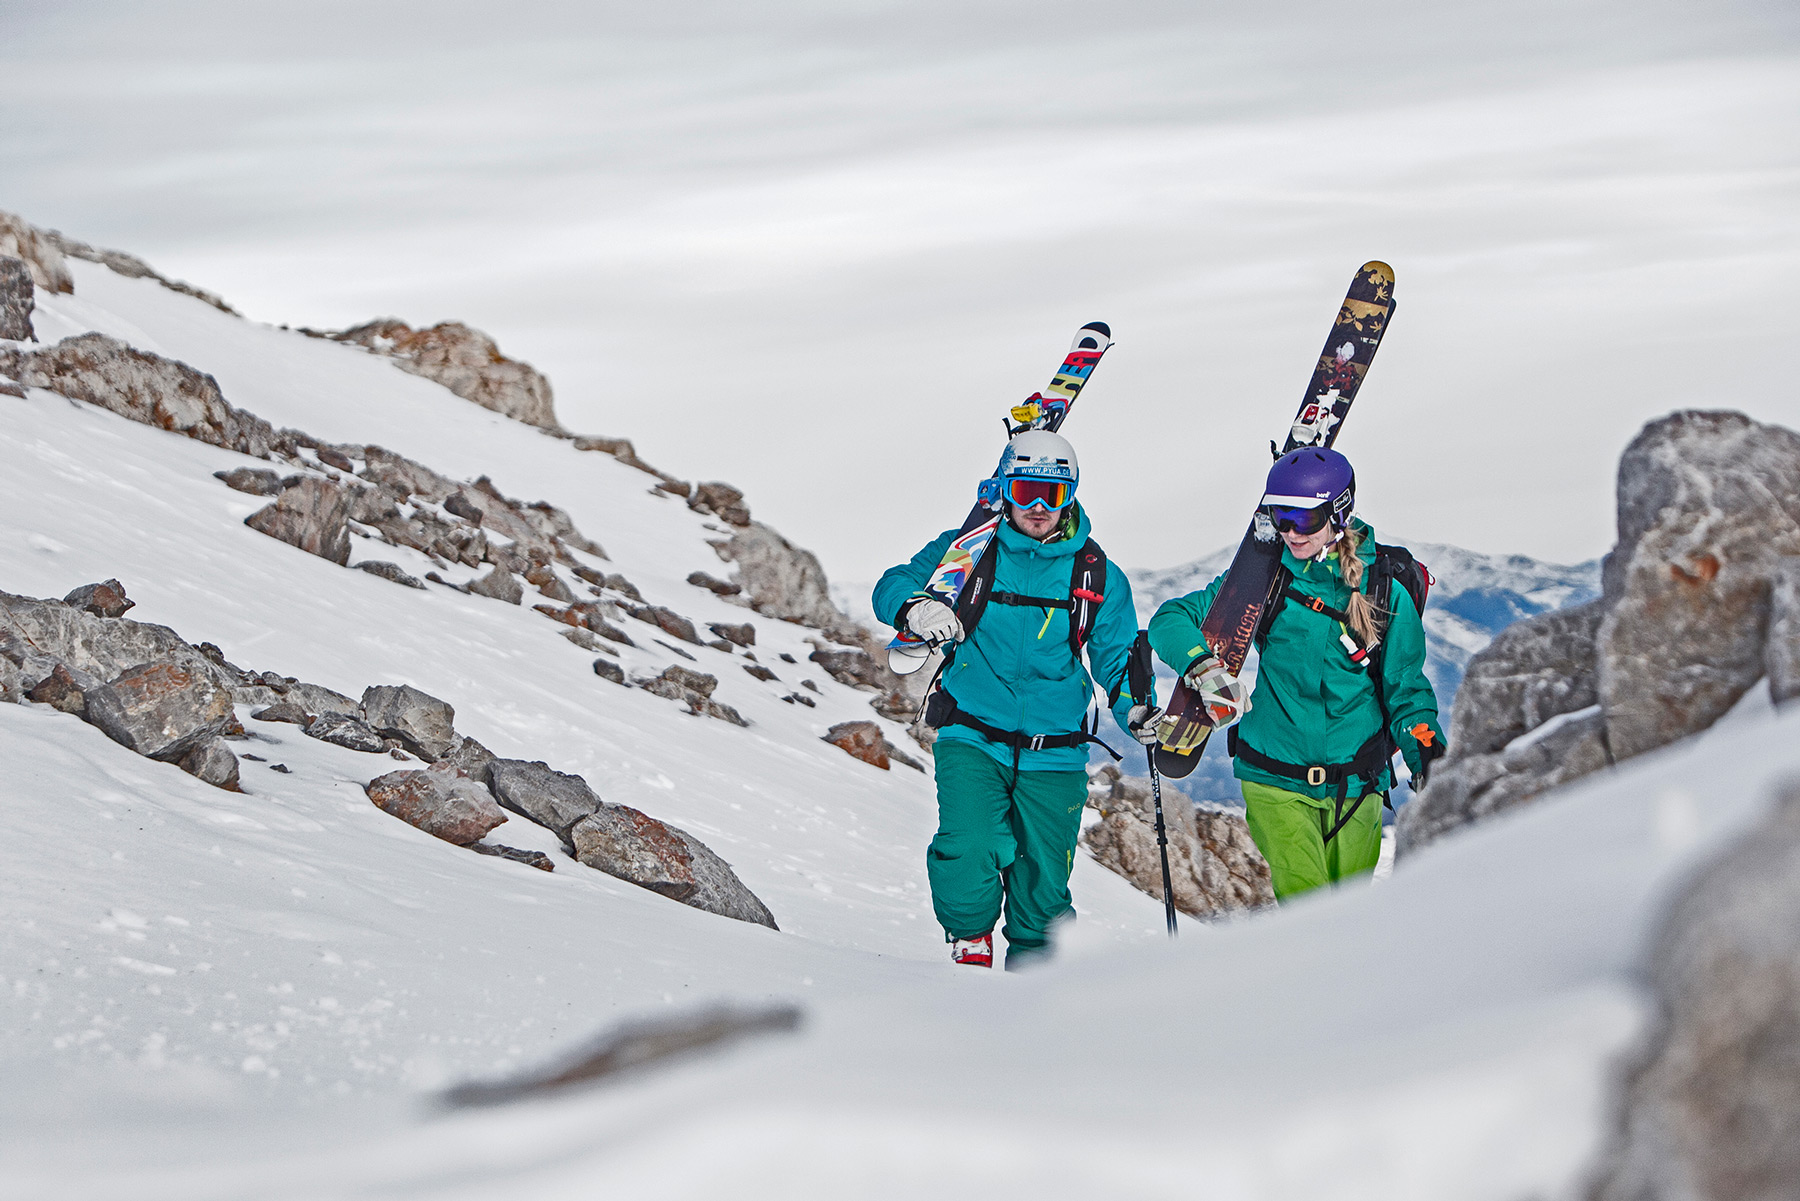 12-Pyua-Dachstein-Ski-Action-Christoph-Gramann